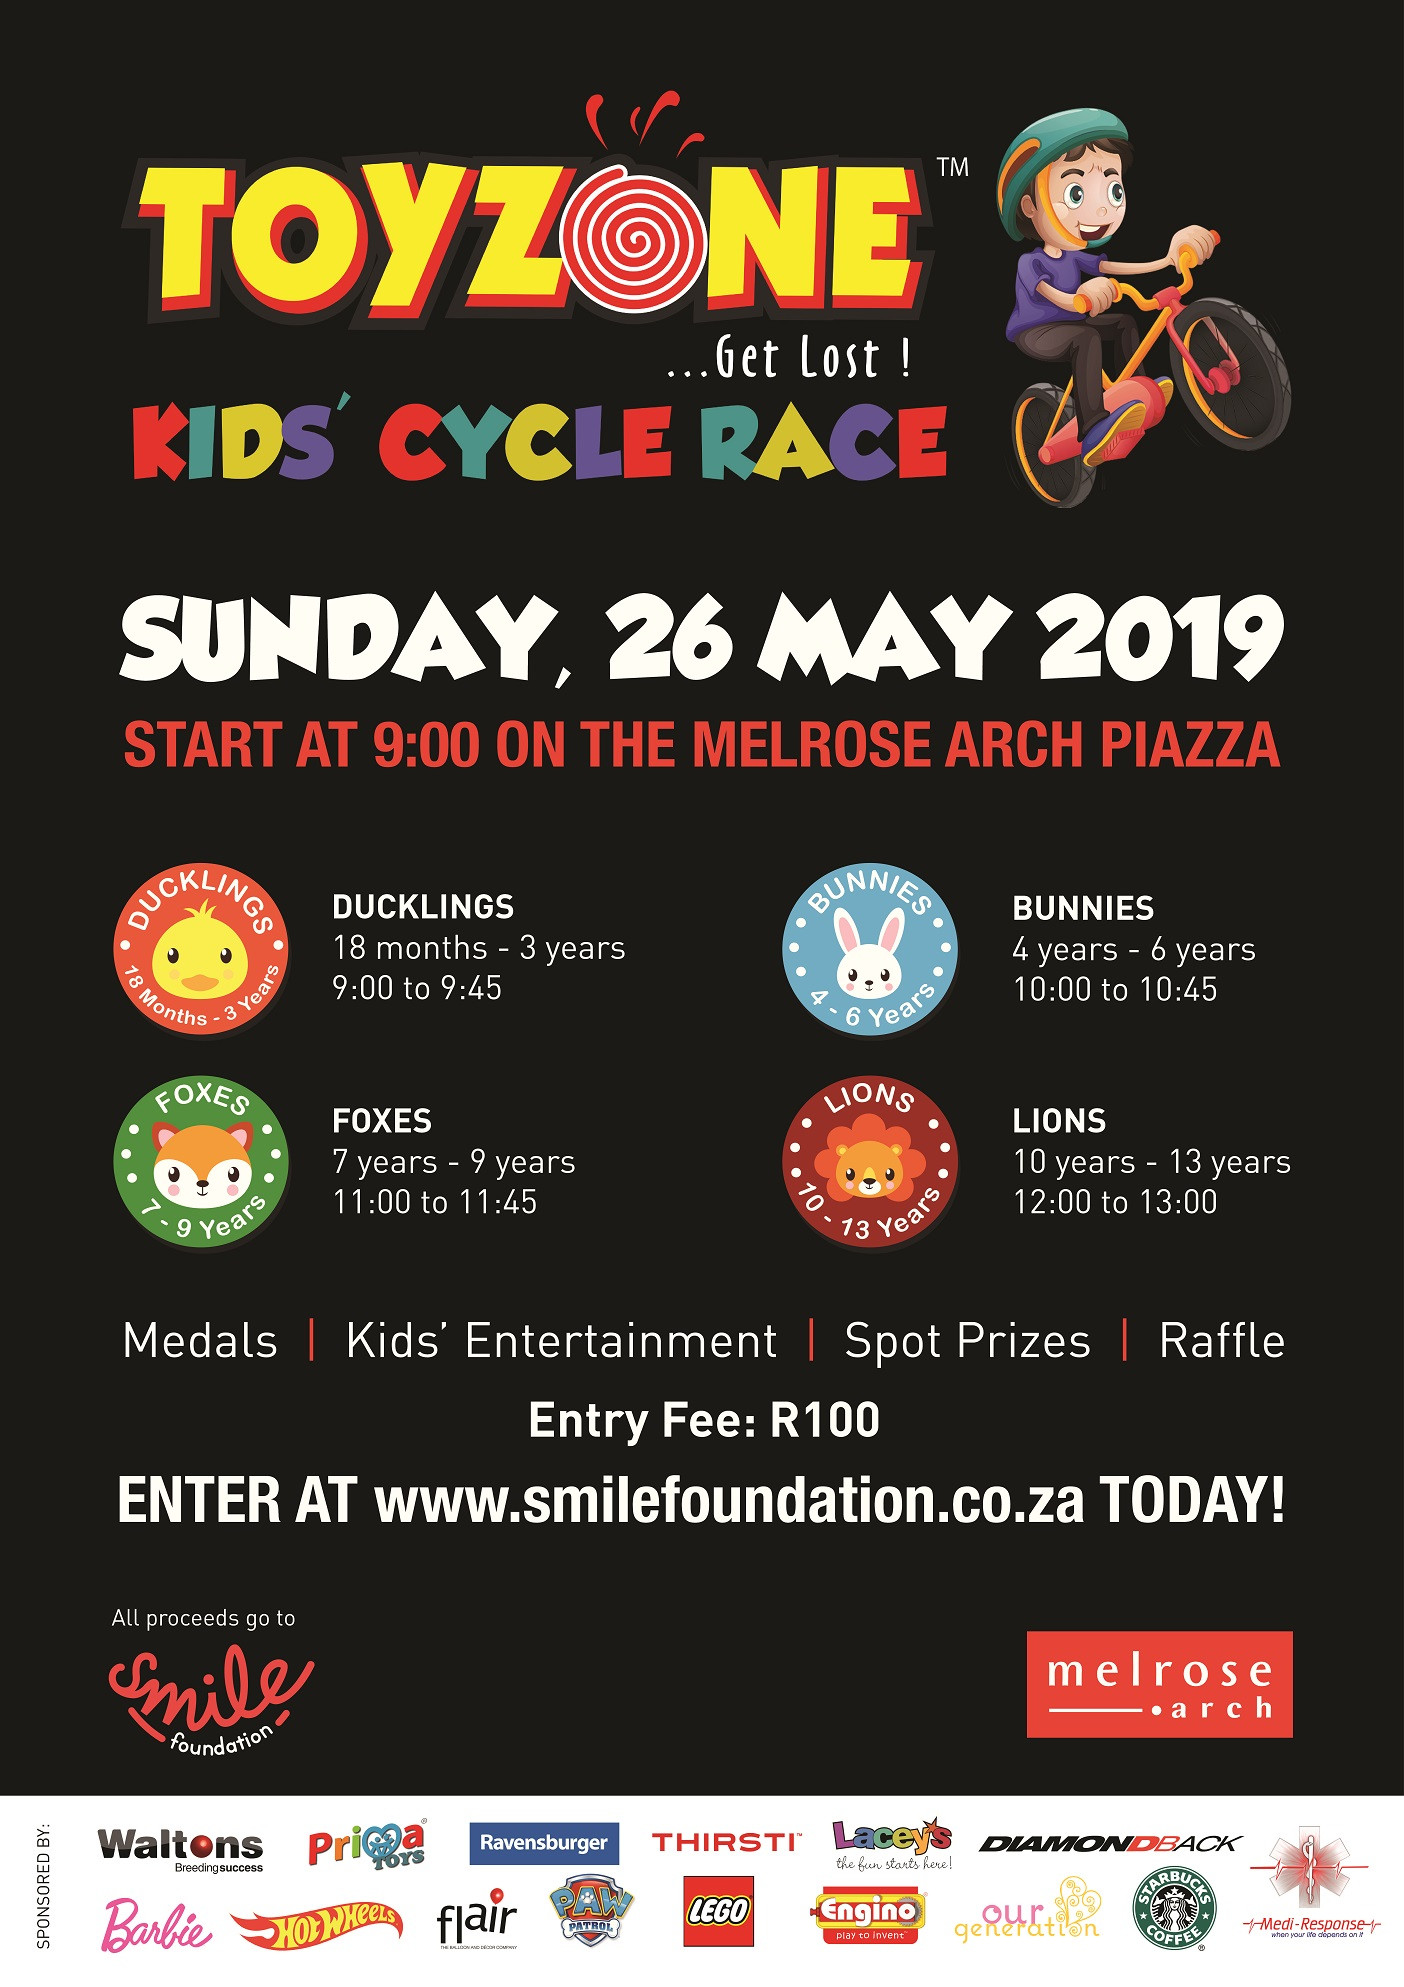 ToyZone Kids' Cycle Race